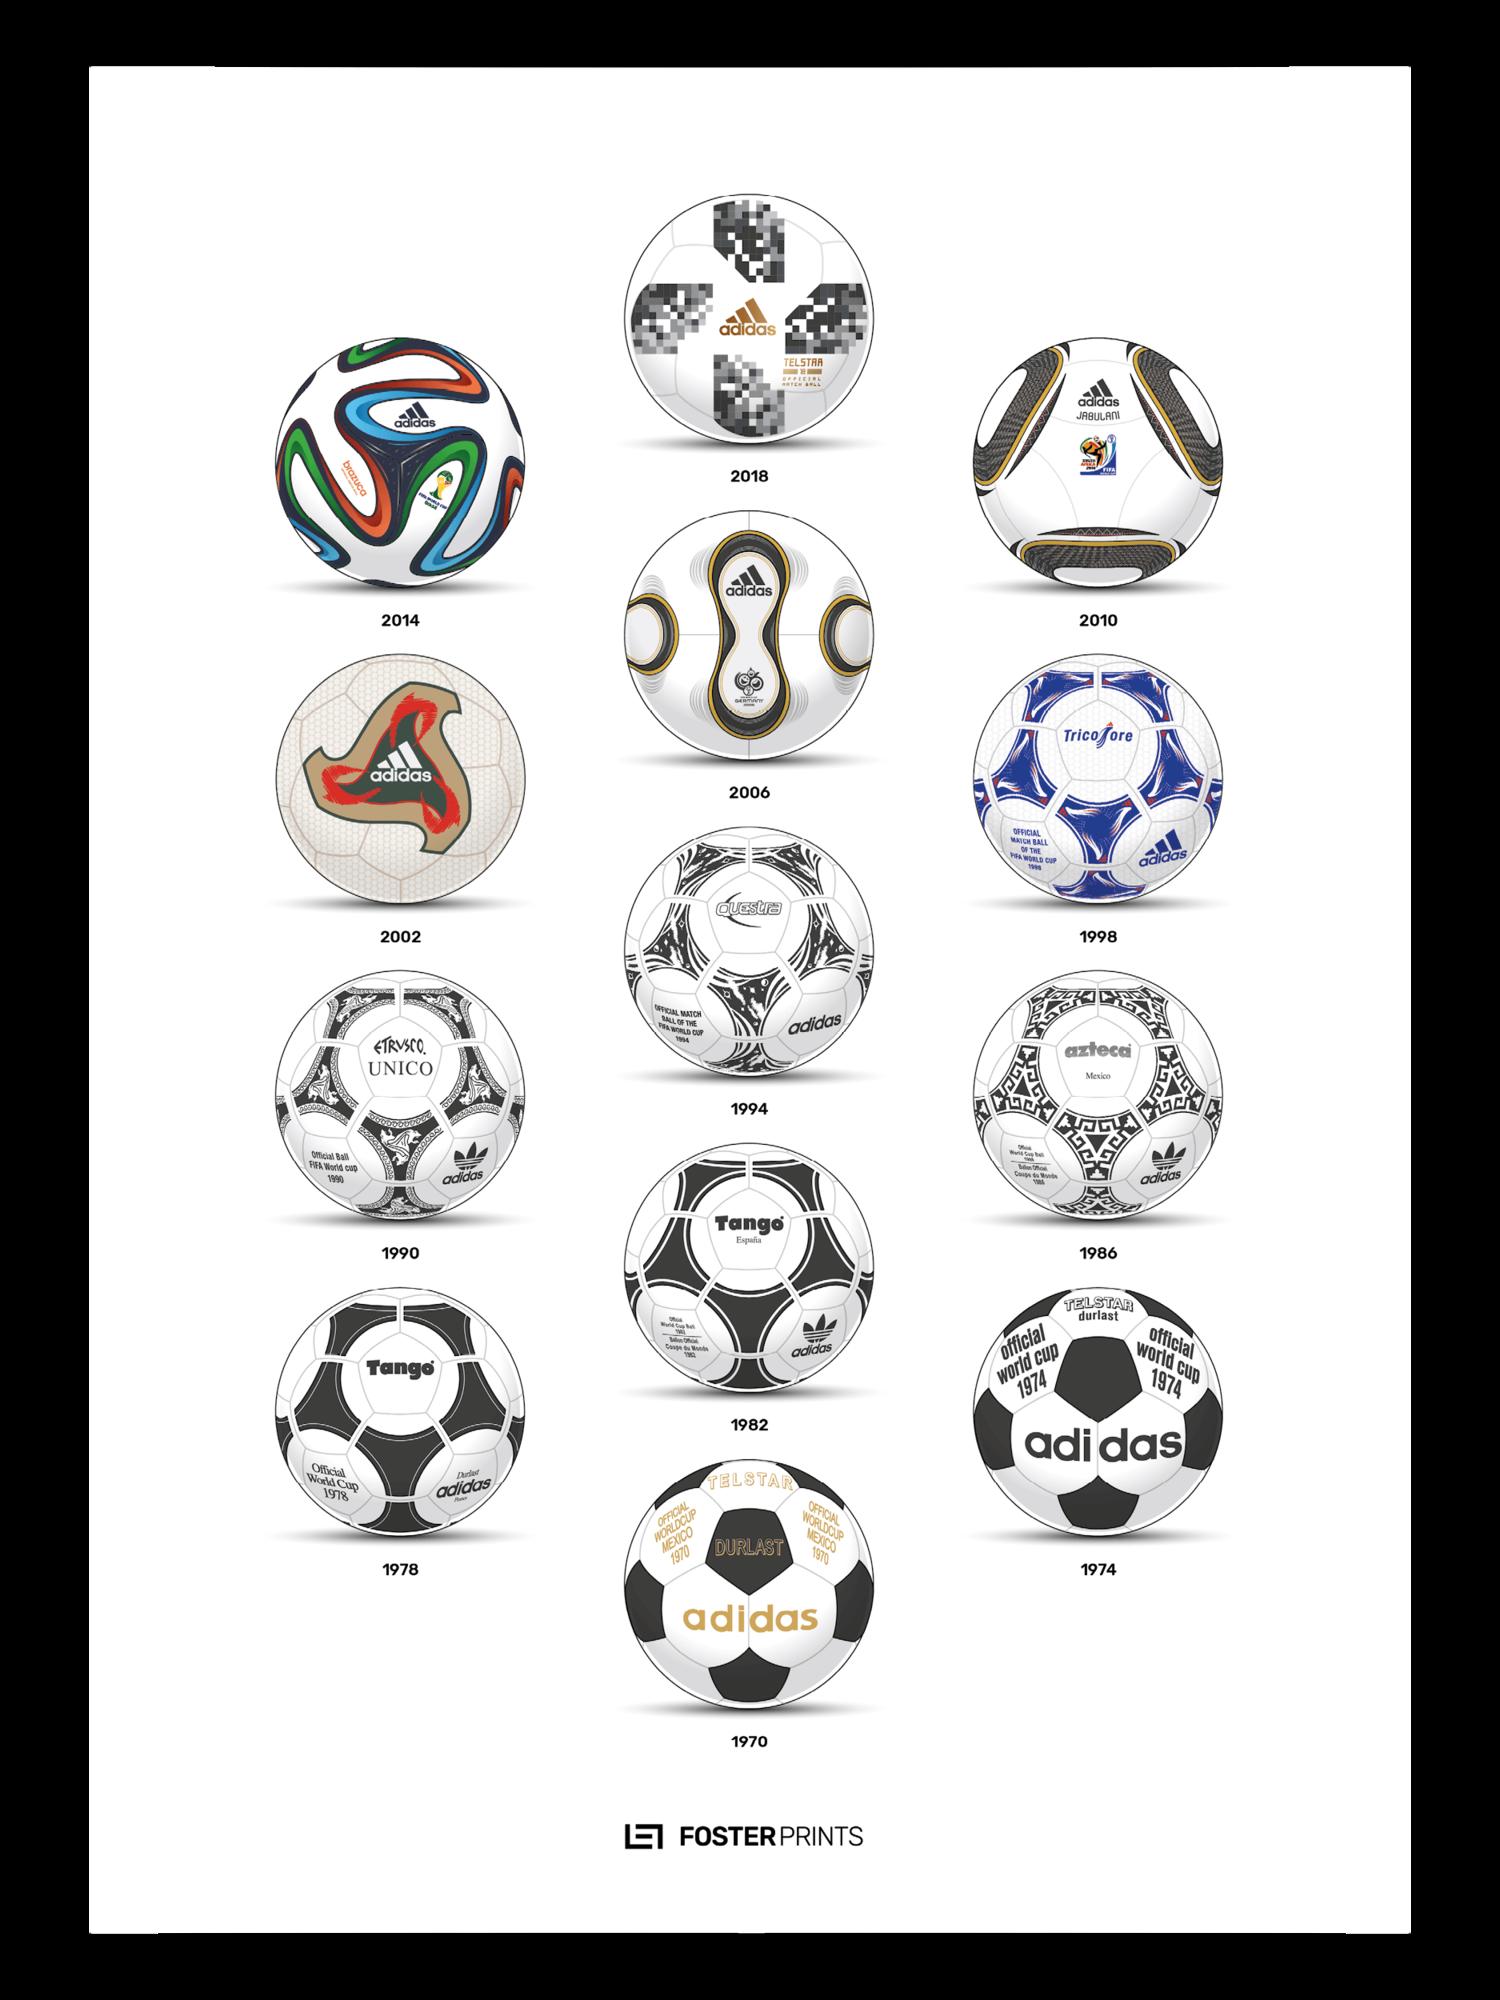 cd2a3f32e9e Adidas World Cup Football History Poster